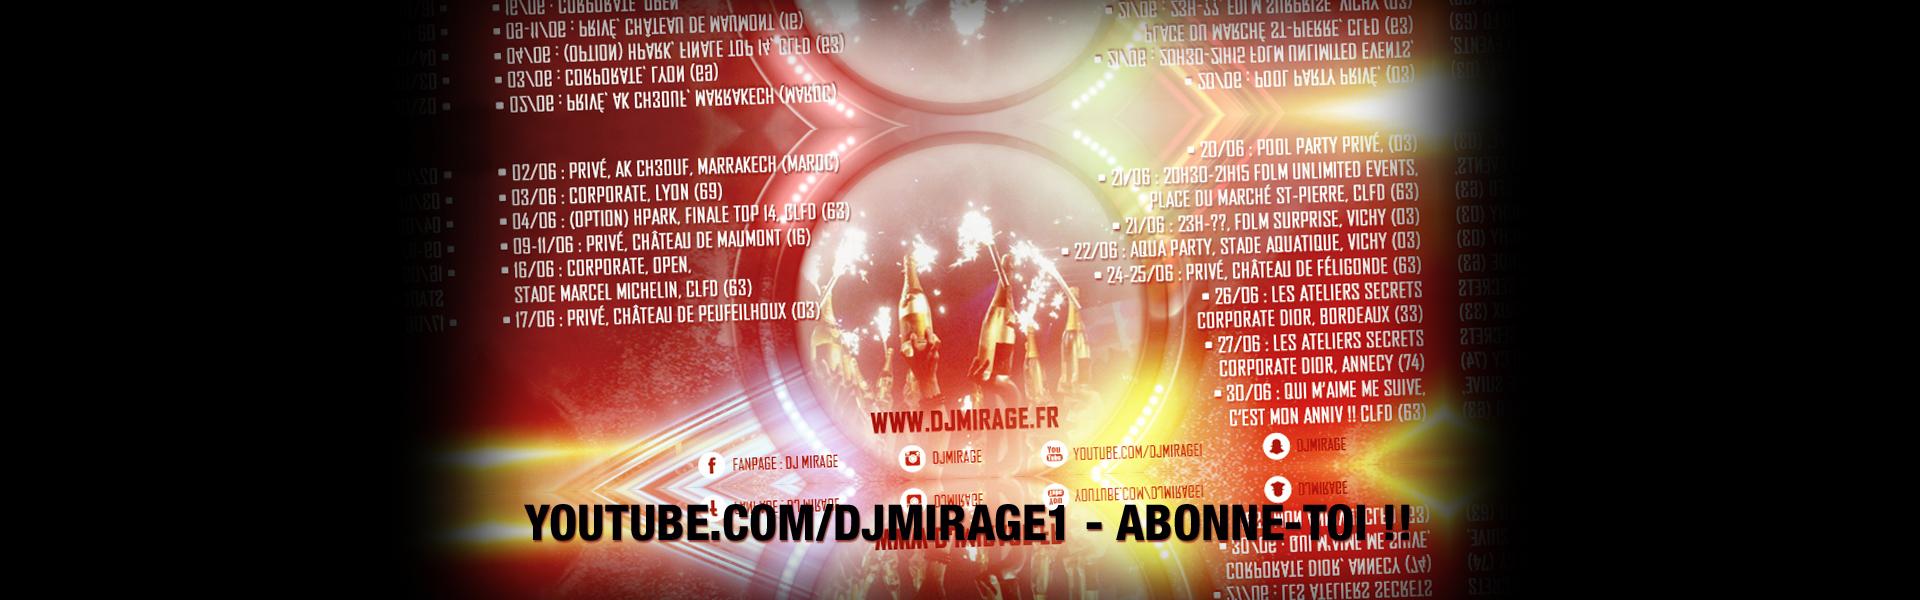 http://djmirage.fr/wp-content/uploads/2016/10/slider-accueil-juin17.jpg